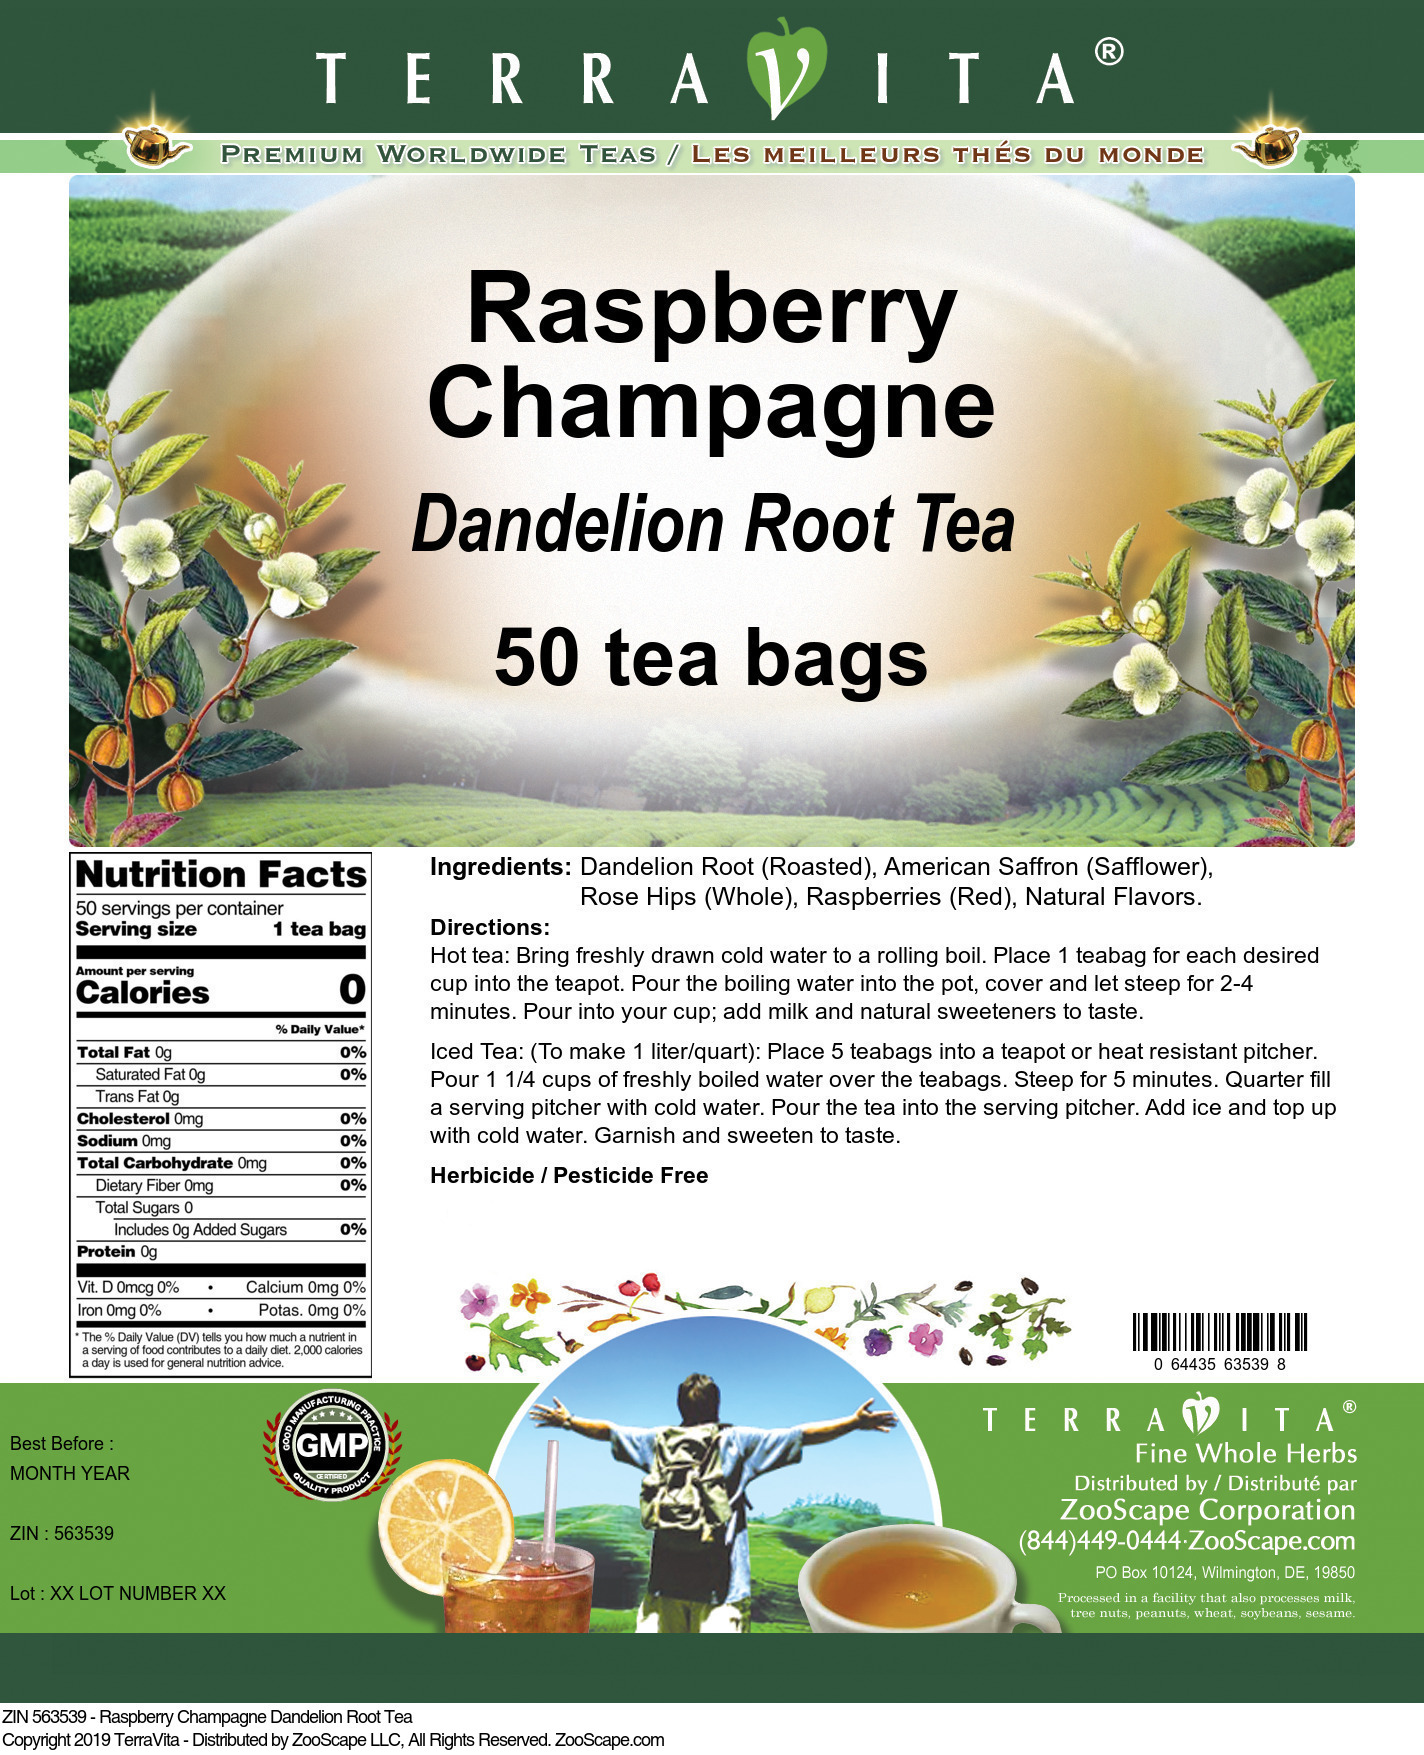 Raspberry Champagne Dandelion Root Tea